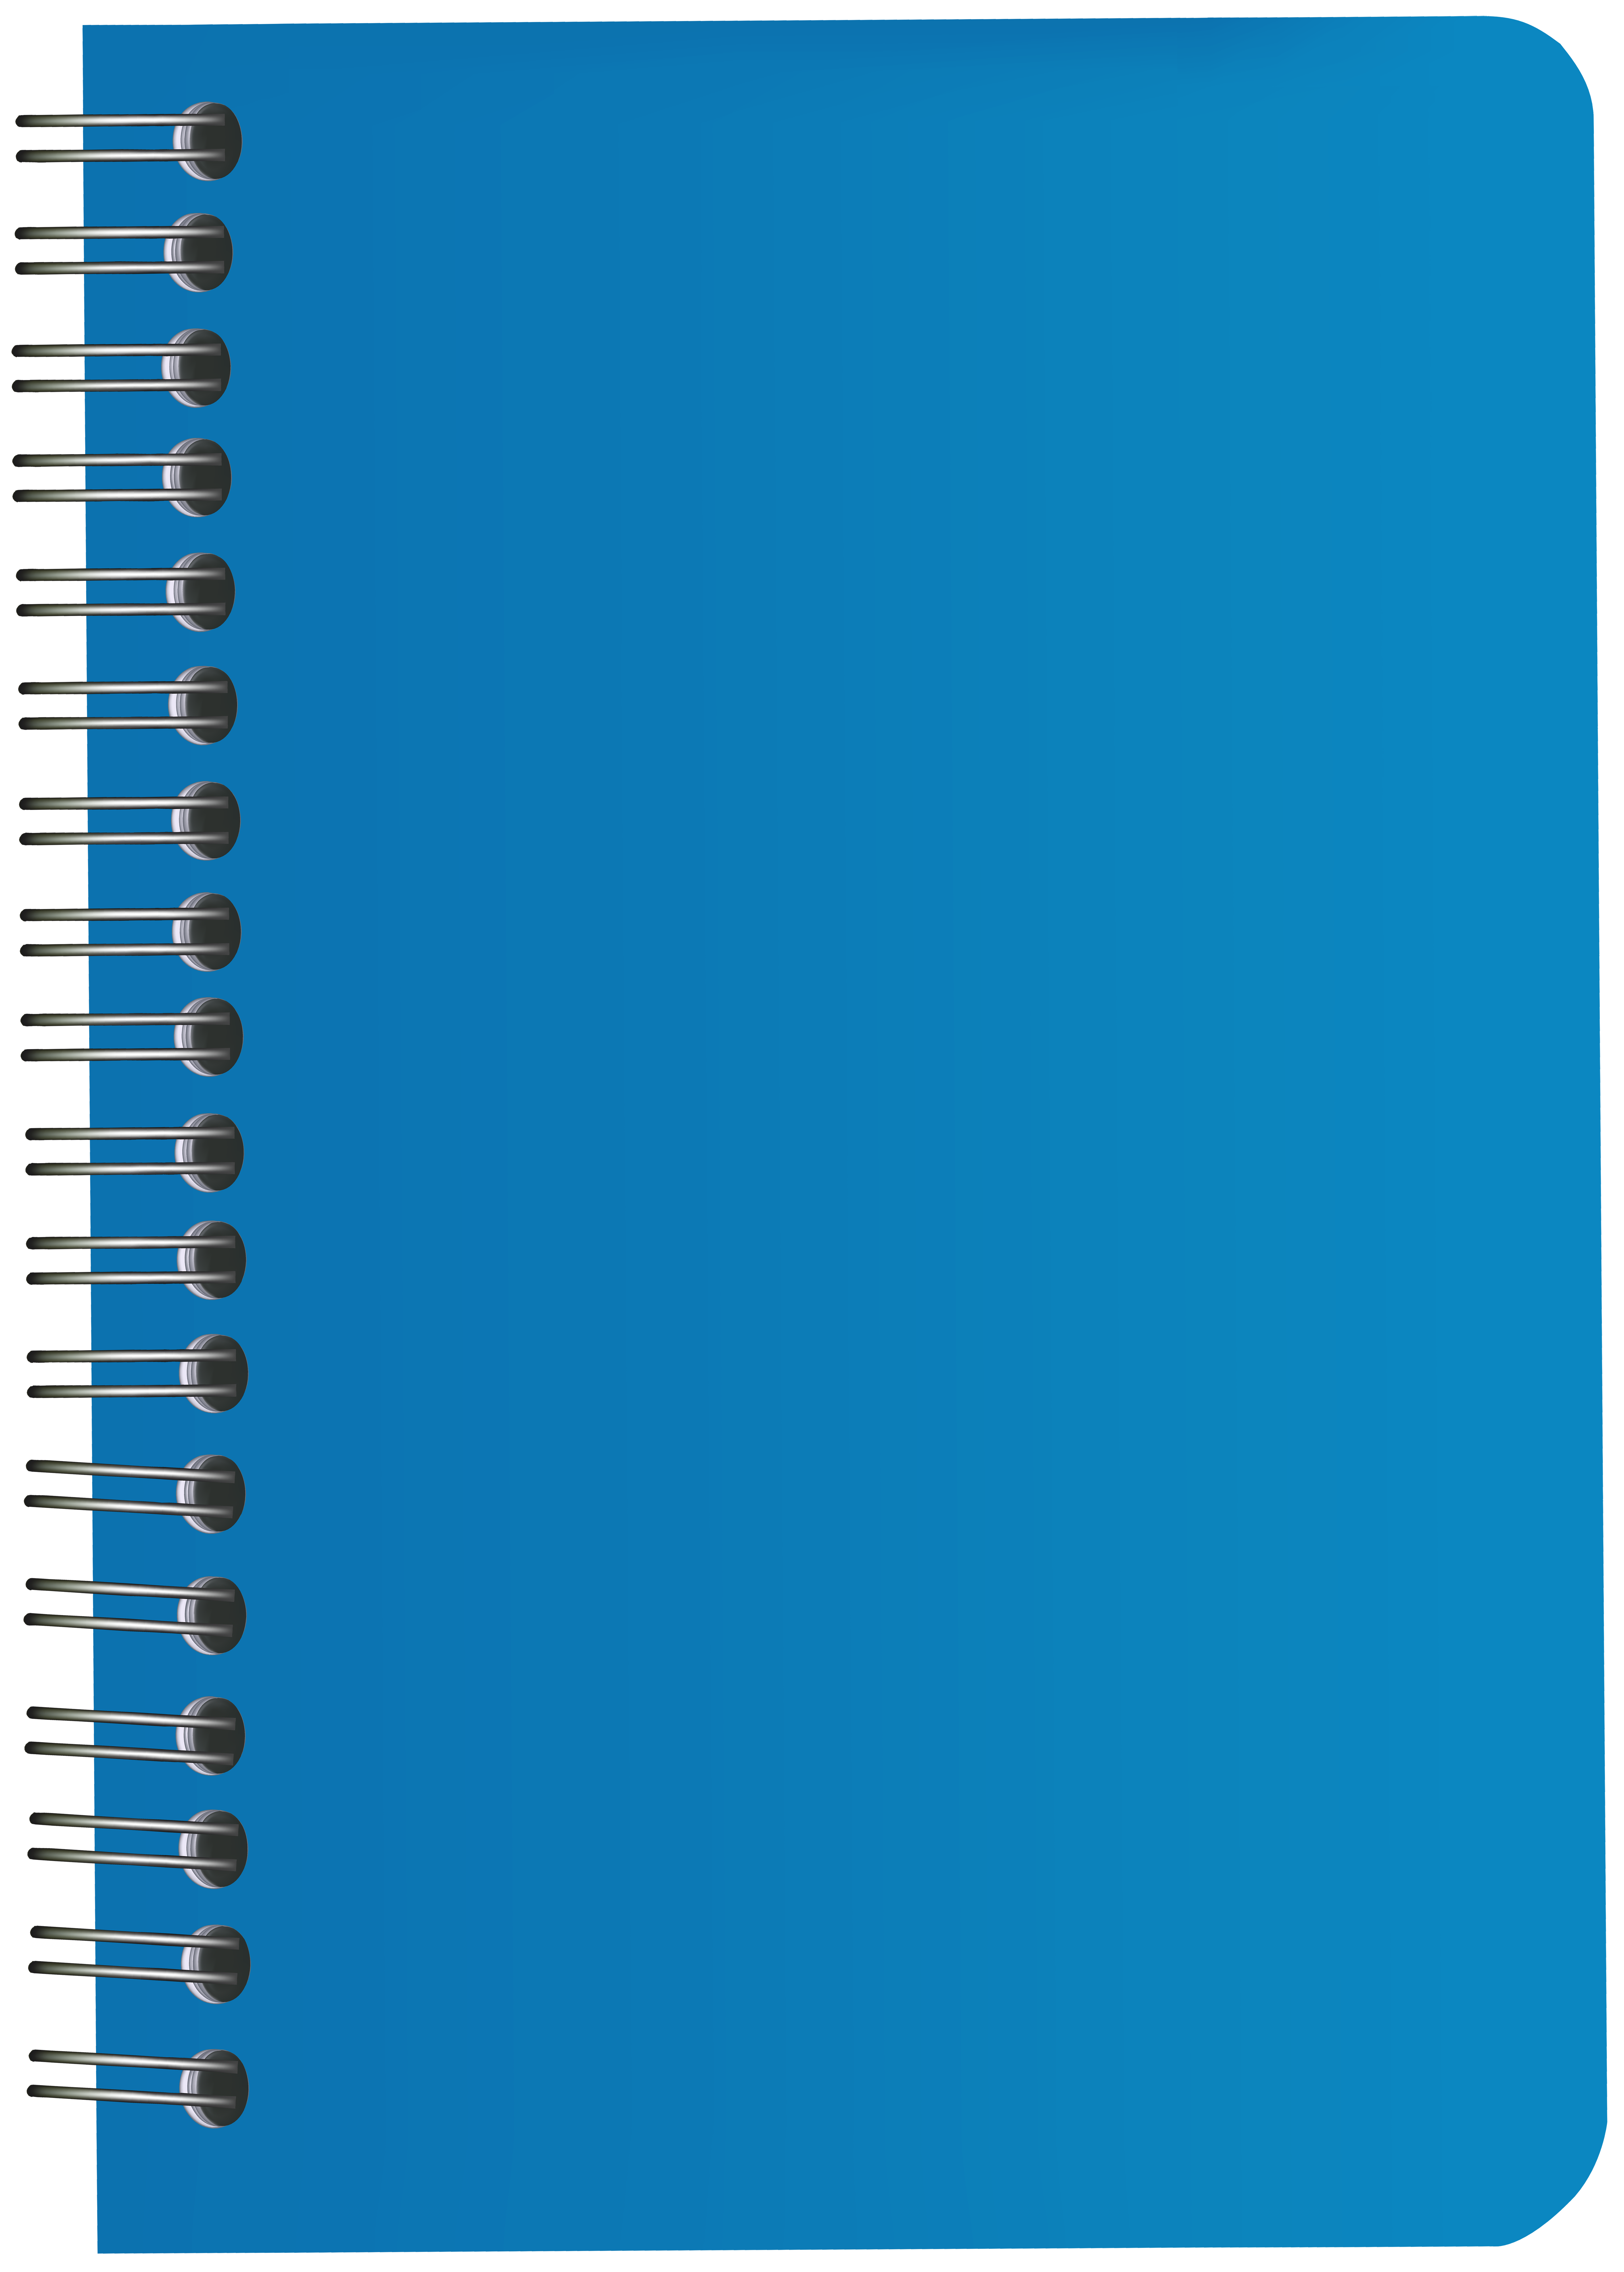 Png clip art image. Notebook clipart blue notebook